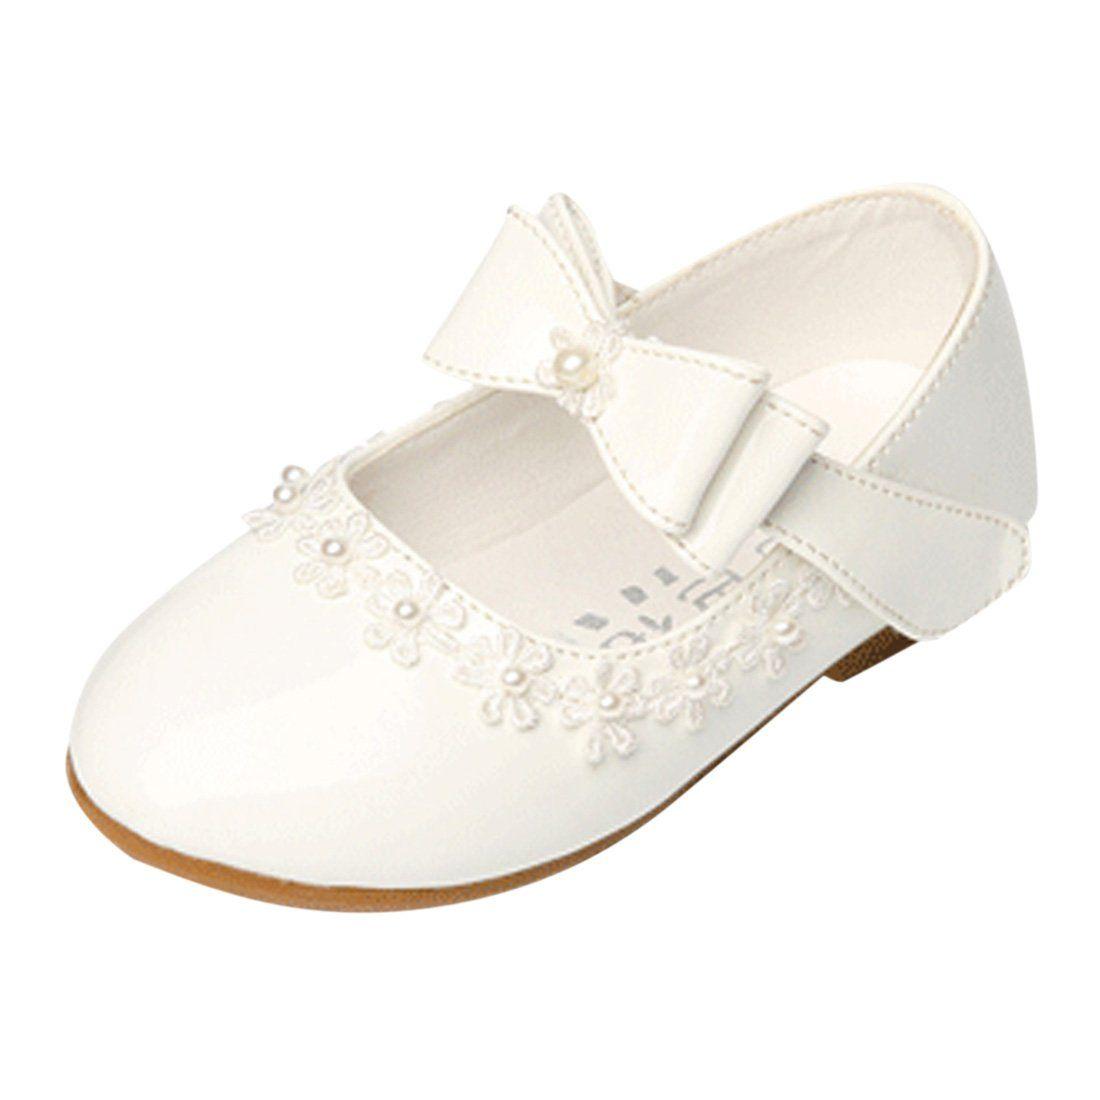 5733726c1 Lopetve Niñas Bowknot Plana Princesa del Bautizo Nupcial Fiesta  Antideslizante Zapatos Escolares Mary Jane Tamaño Blanco